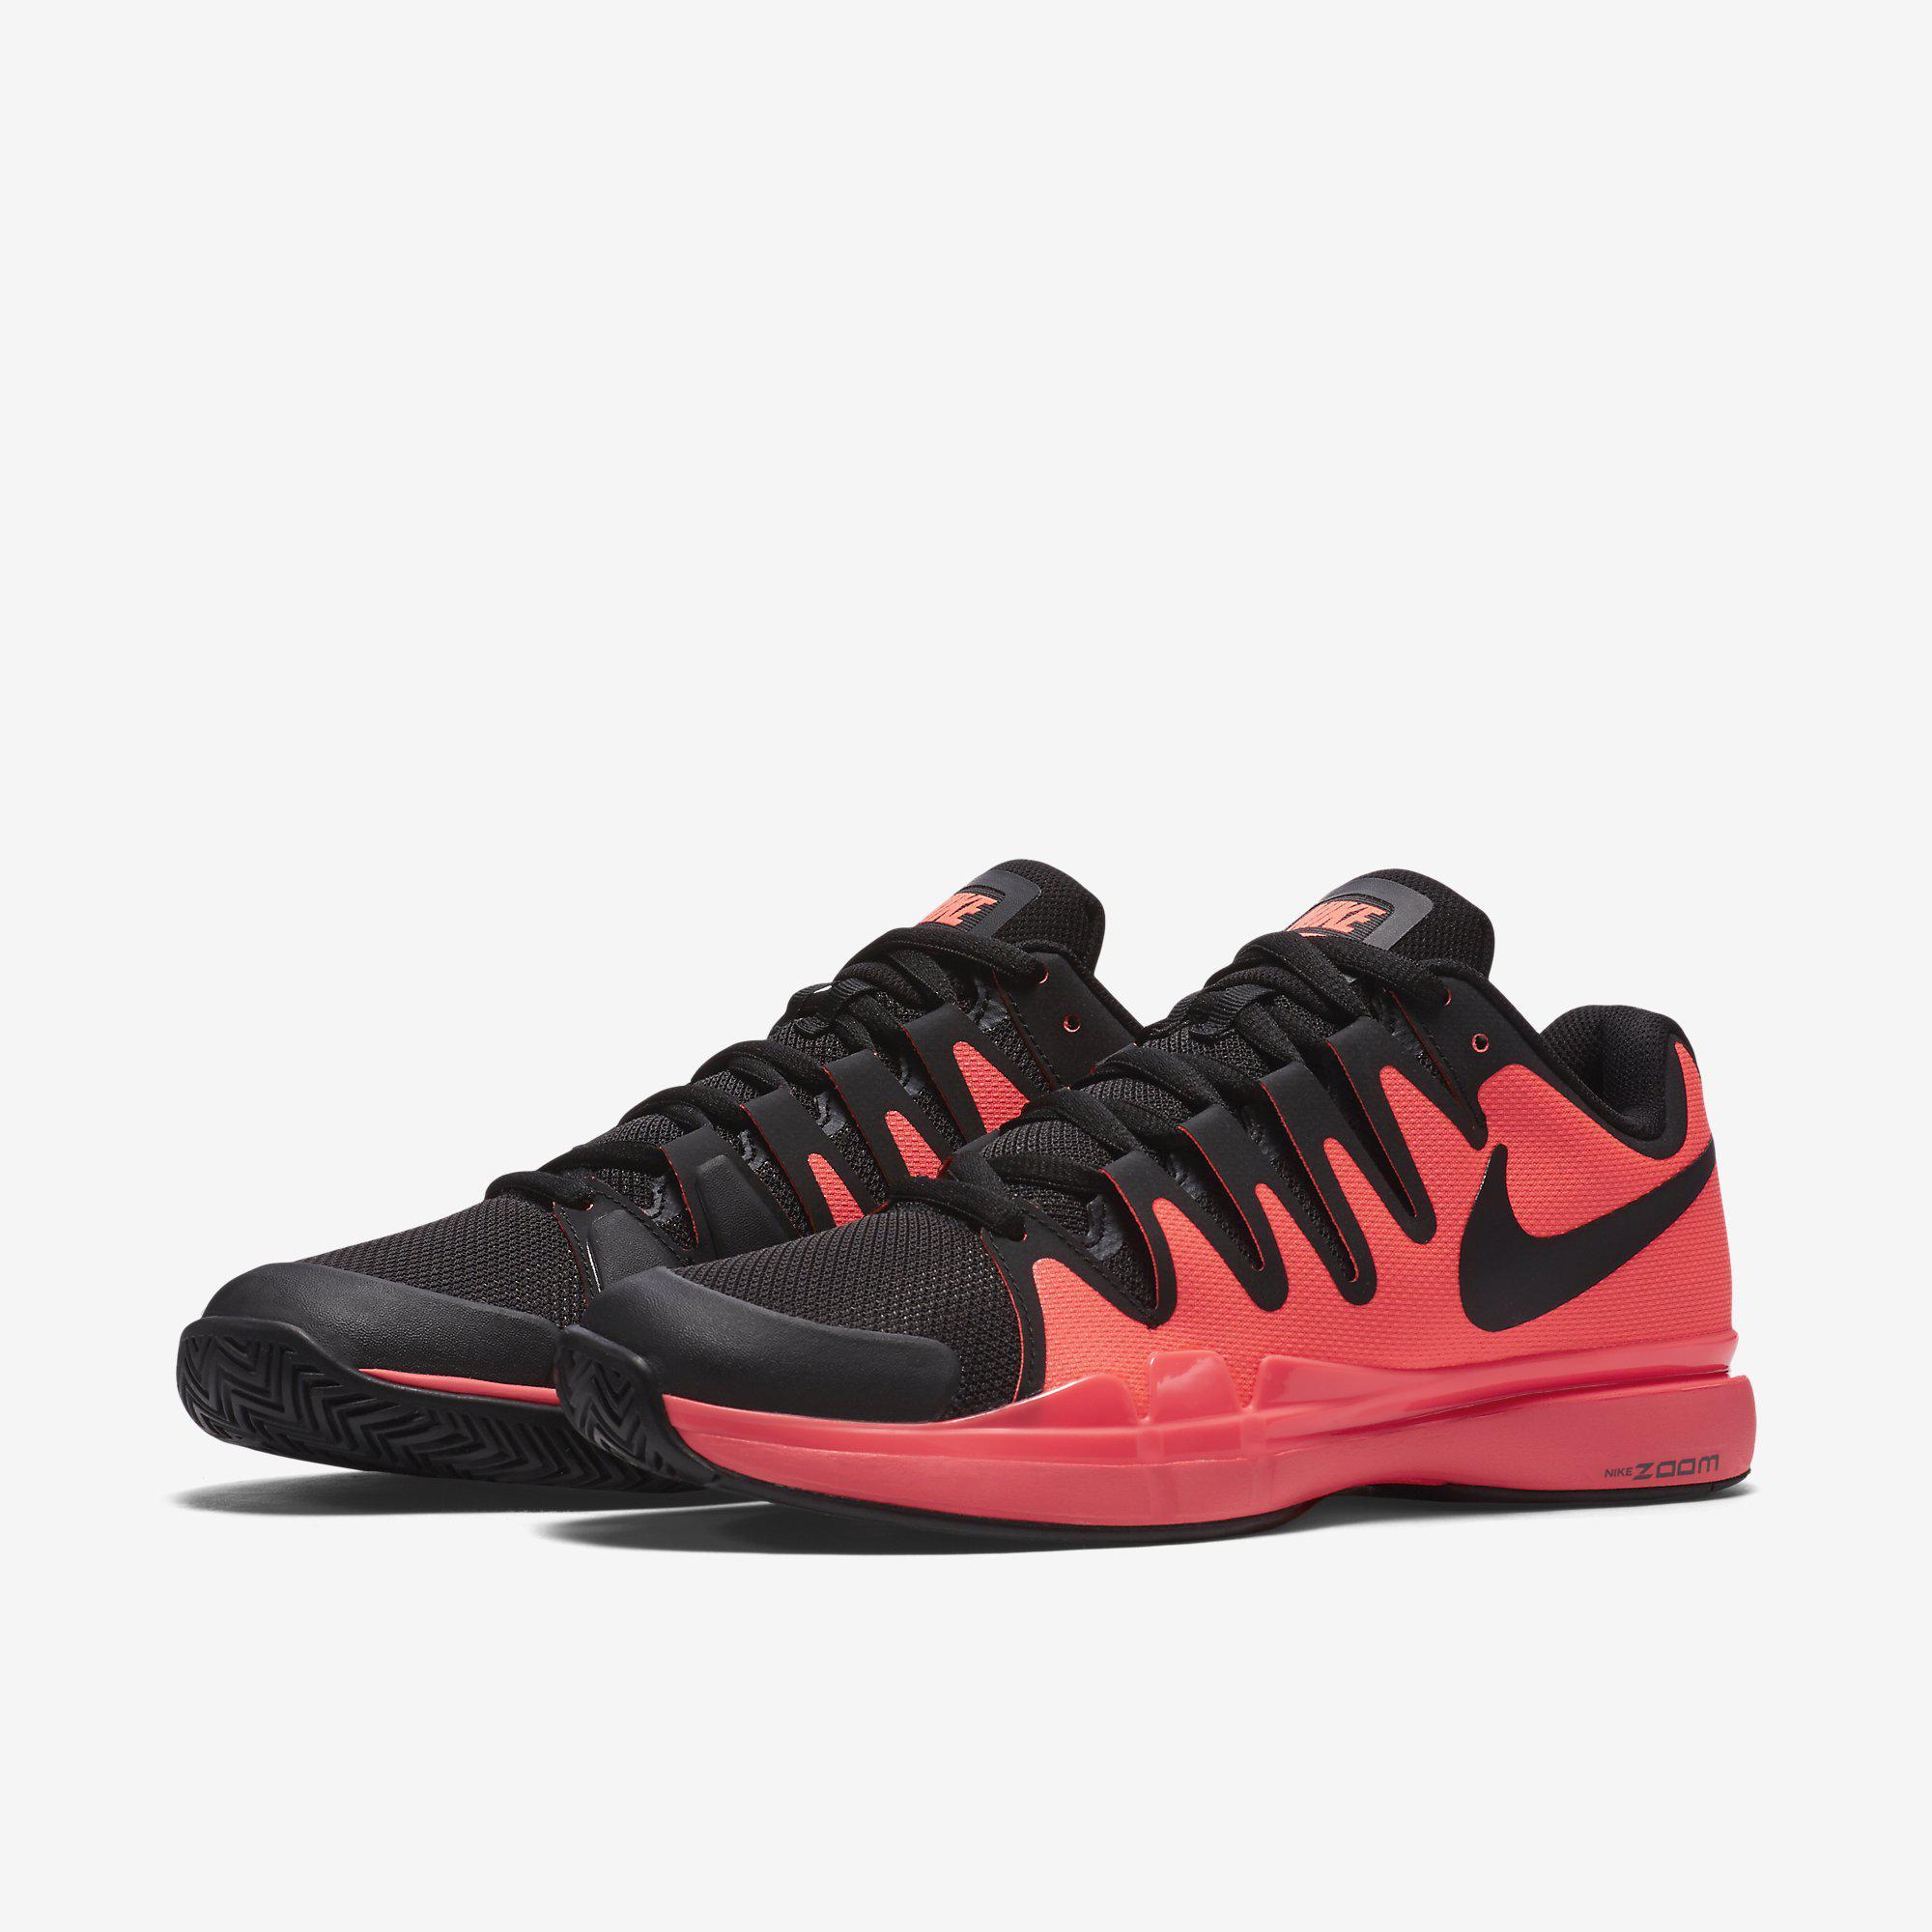 Out Of Stock. Nike Mens Zoom Vapor 9.5 Tour Tennis Shoes - Hot Lava/Black  ...